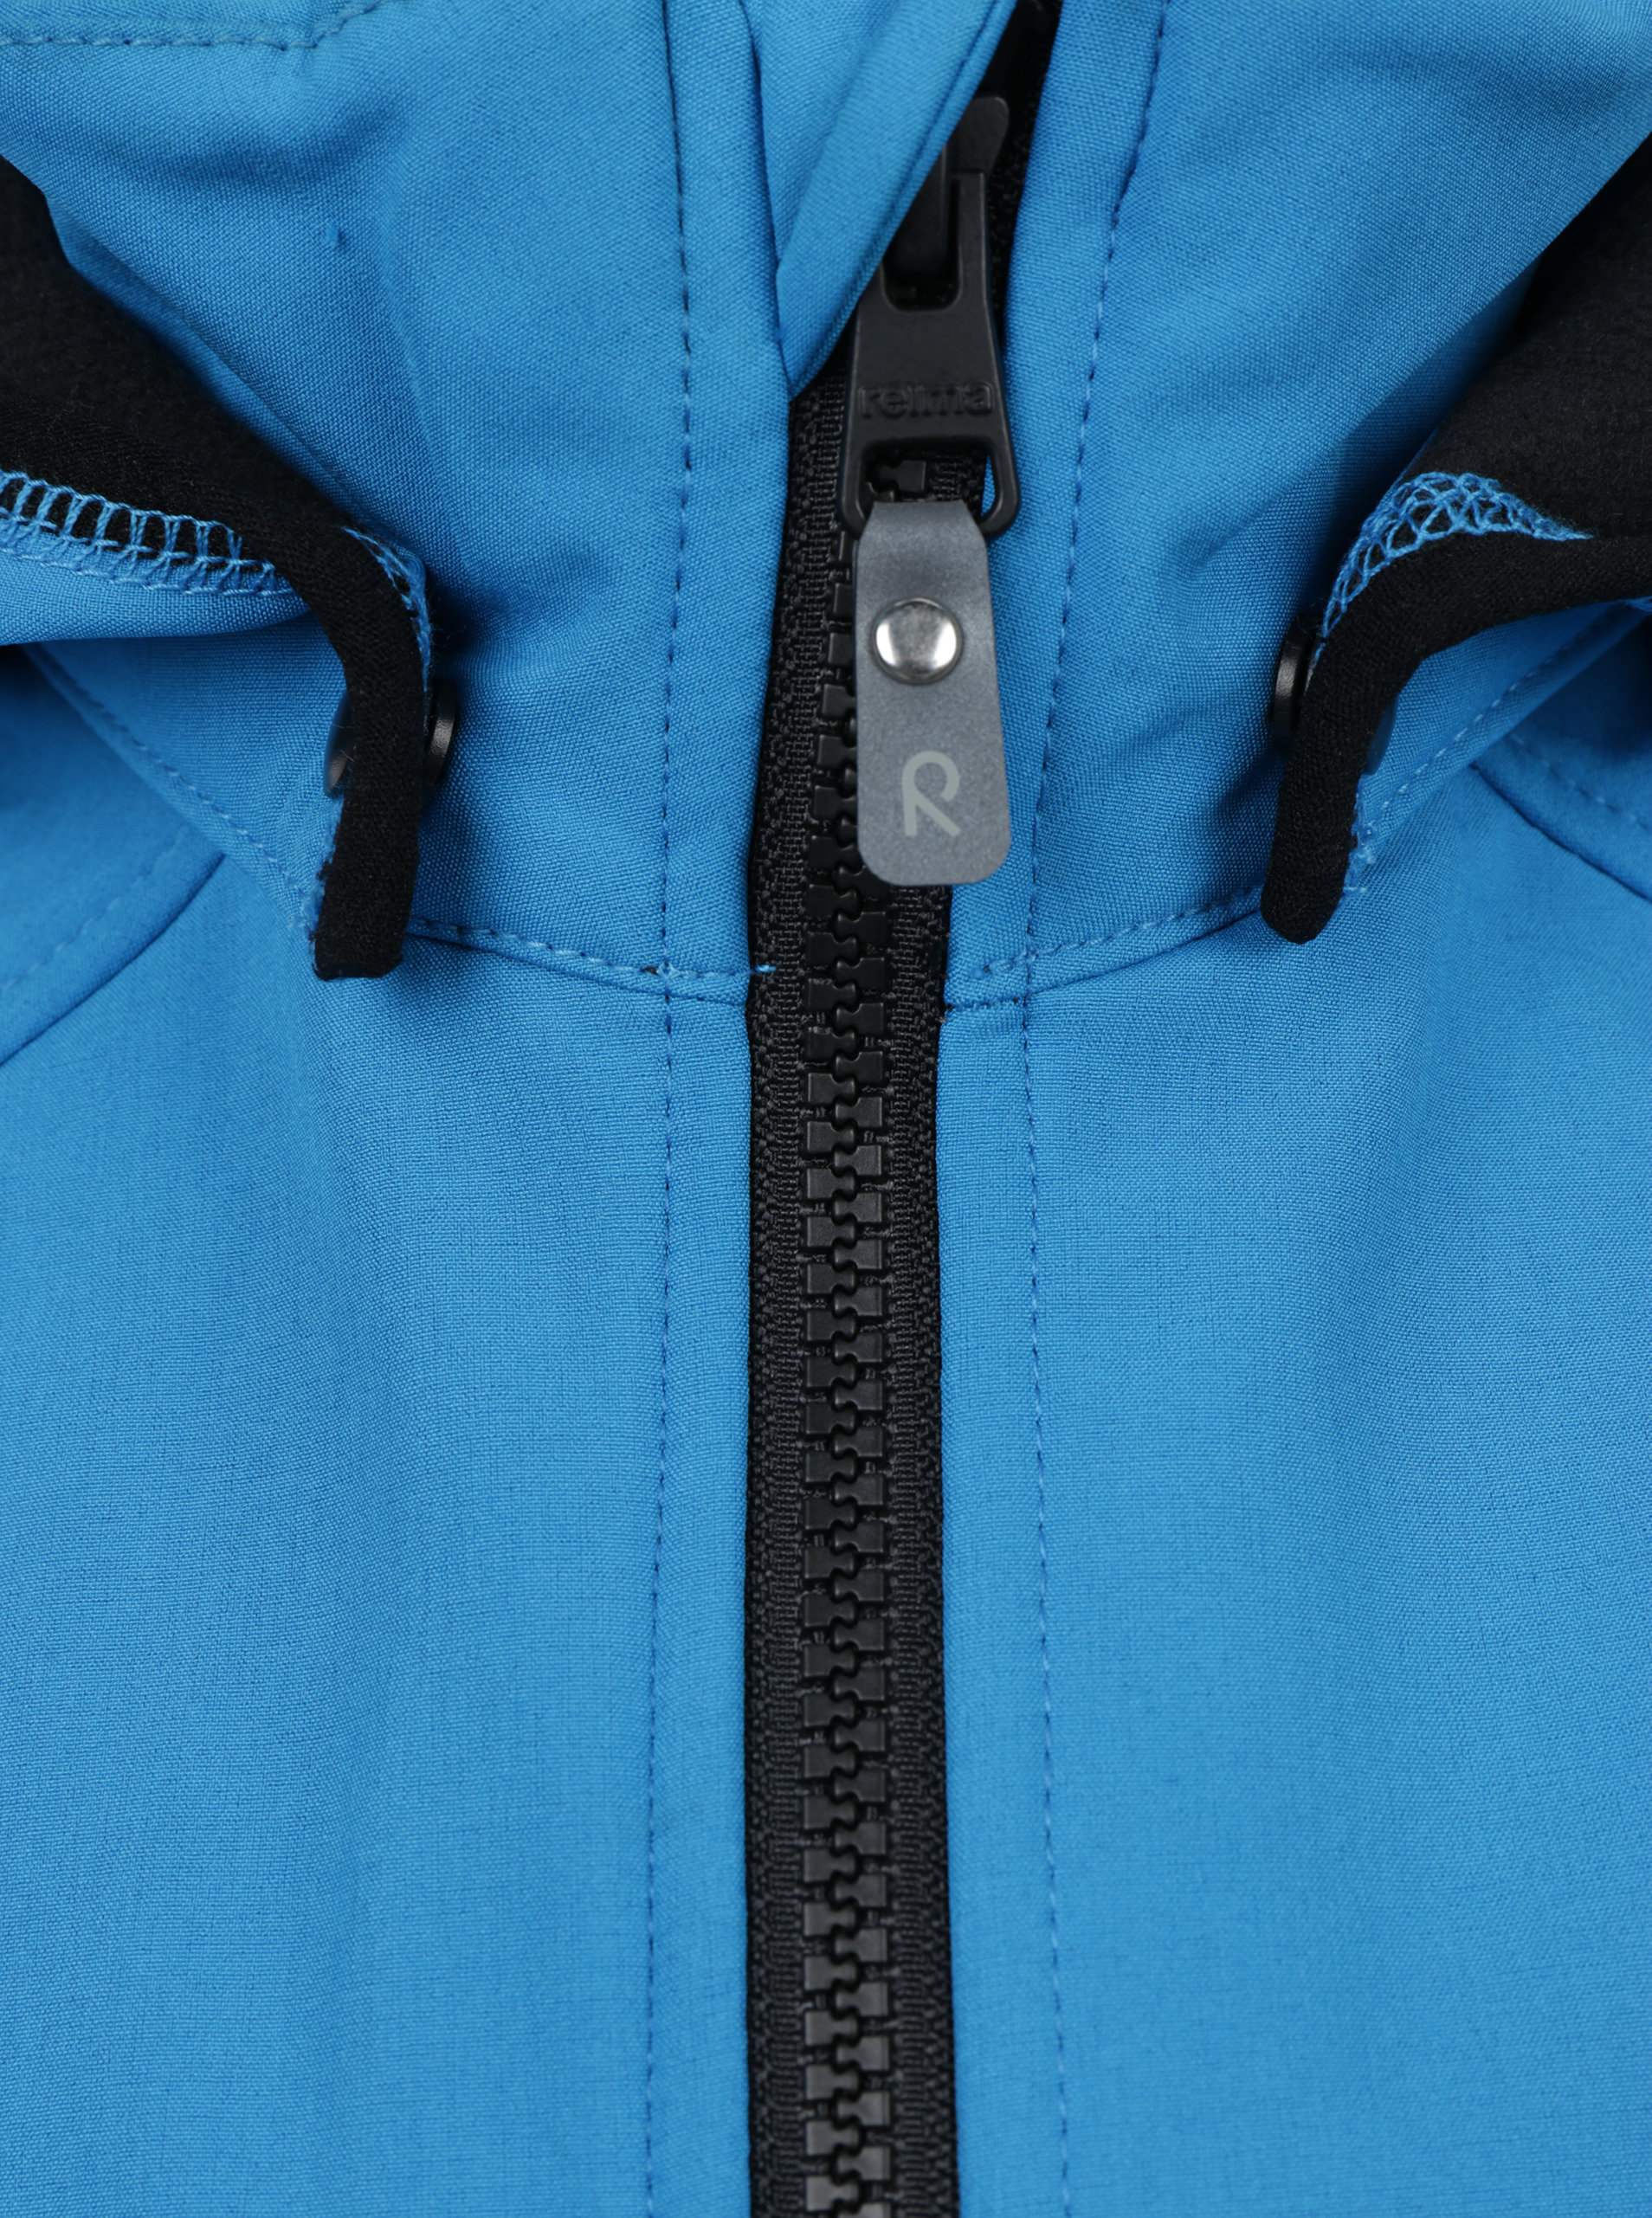 dbabc6f7b87e8 Modrá chlapčenská vodovzdorná softshellová bunda s kapucňou Reima Zayak ...